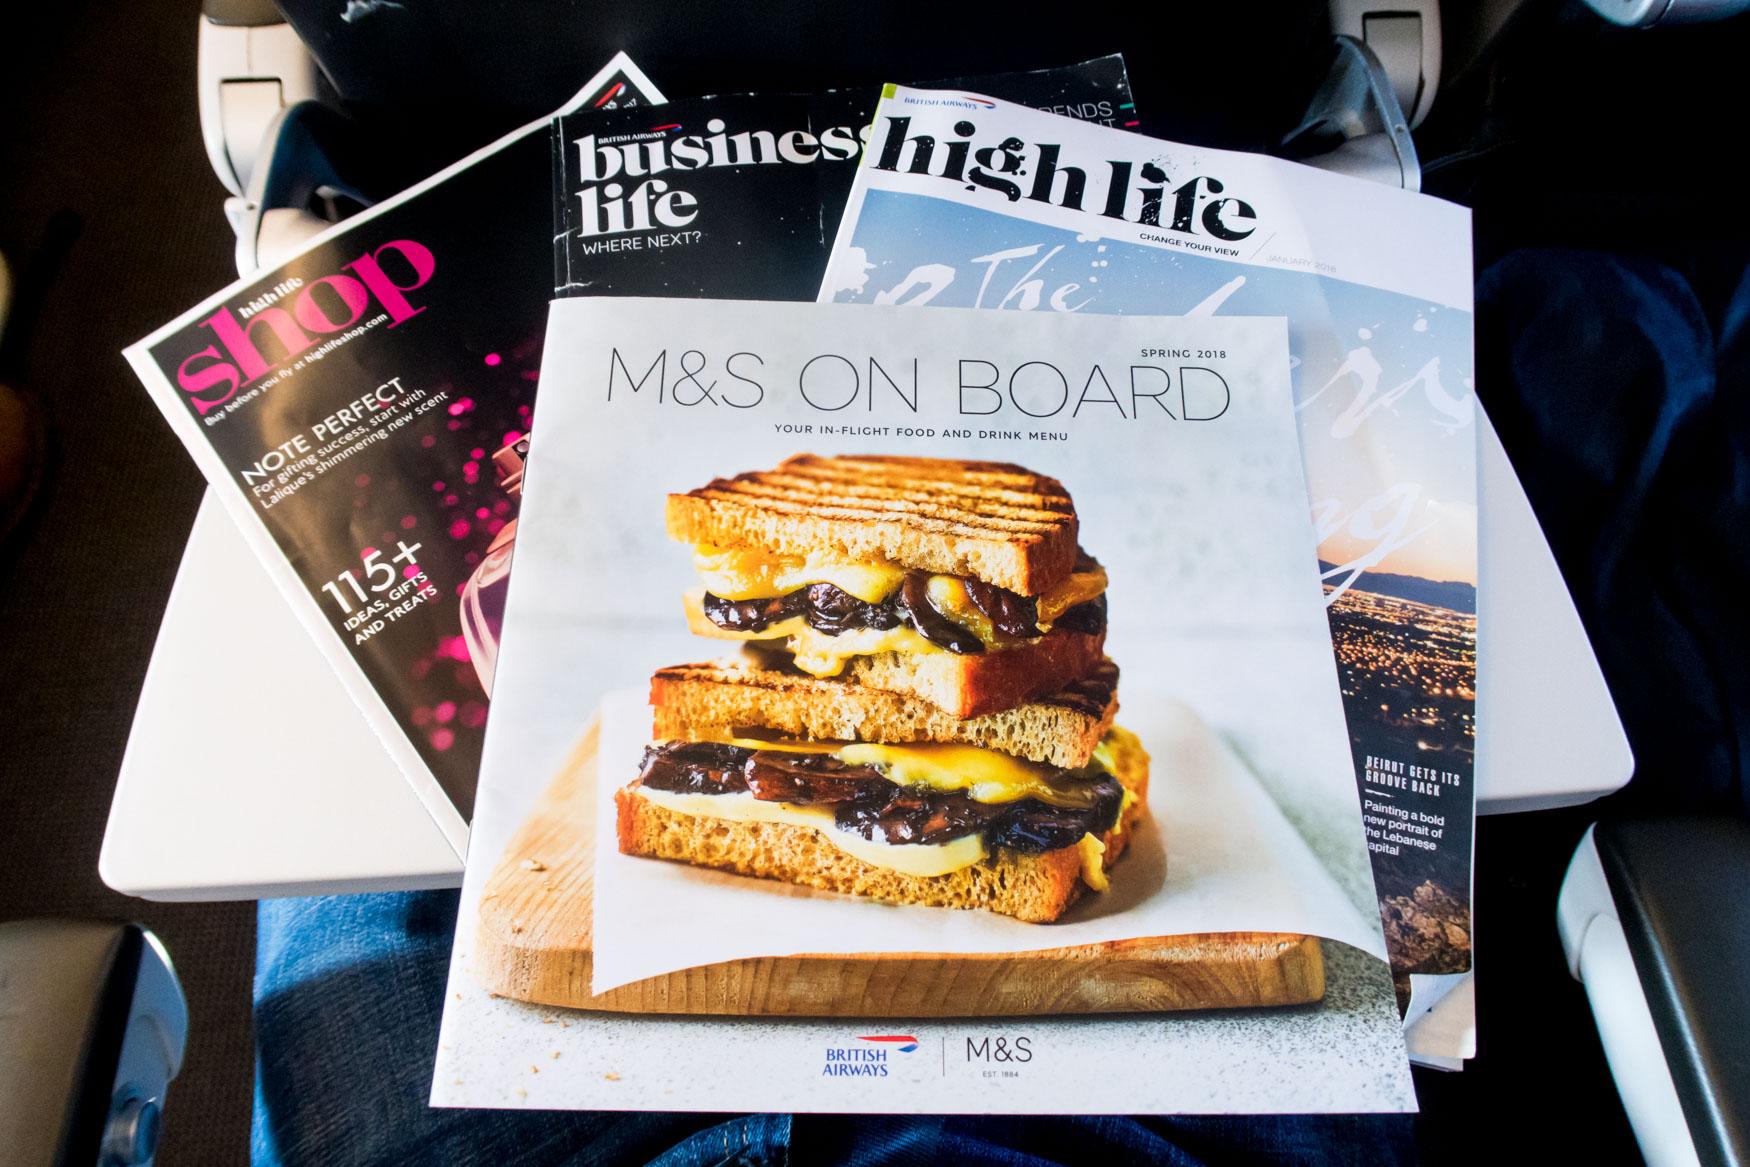 British Airways In-Flight Magazines and Shopping